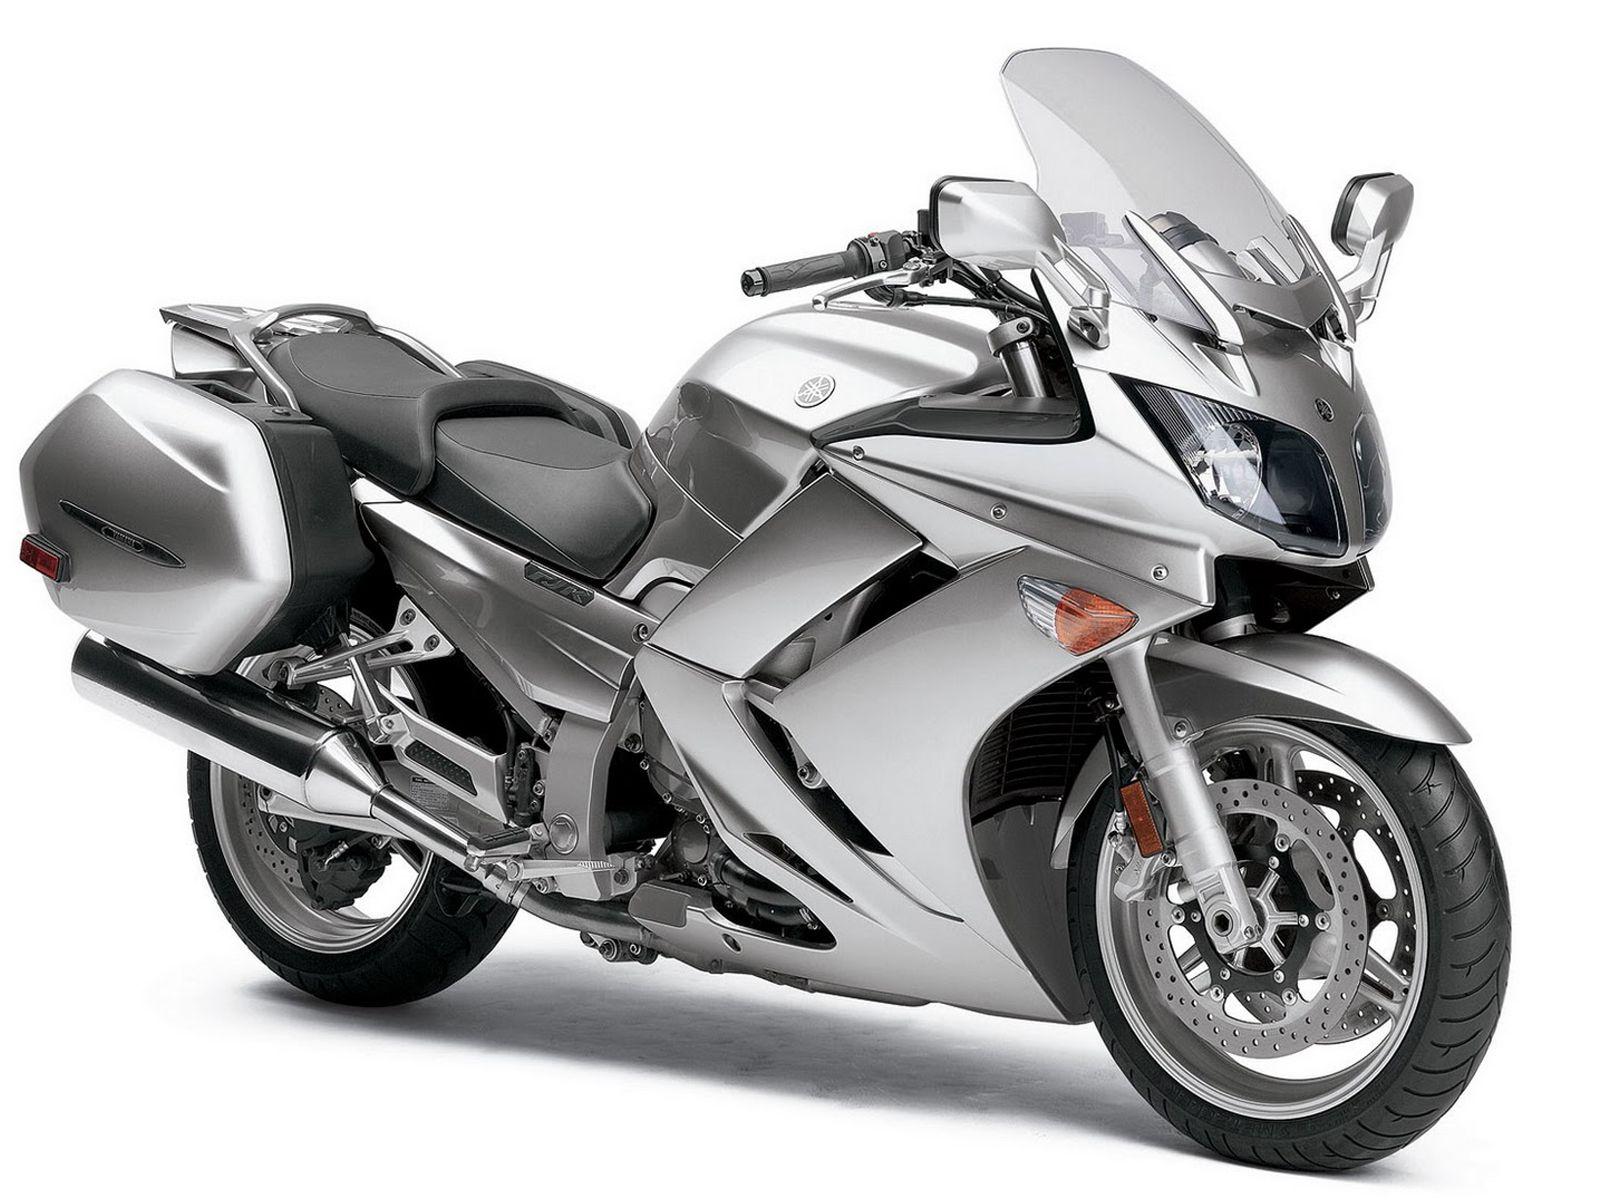 Beautiful Yamaha Fjr1300 2012 Custom Motorcycles Classic Motorcycles Motorcycle Touring Motorcycles Yamaha Motorbikes